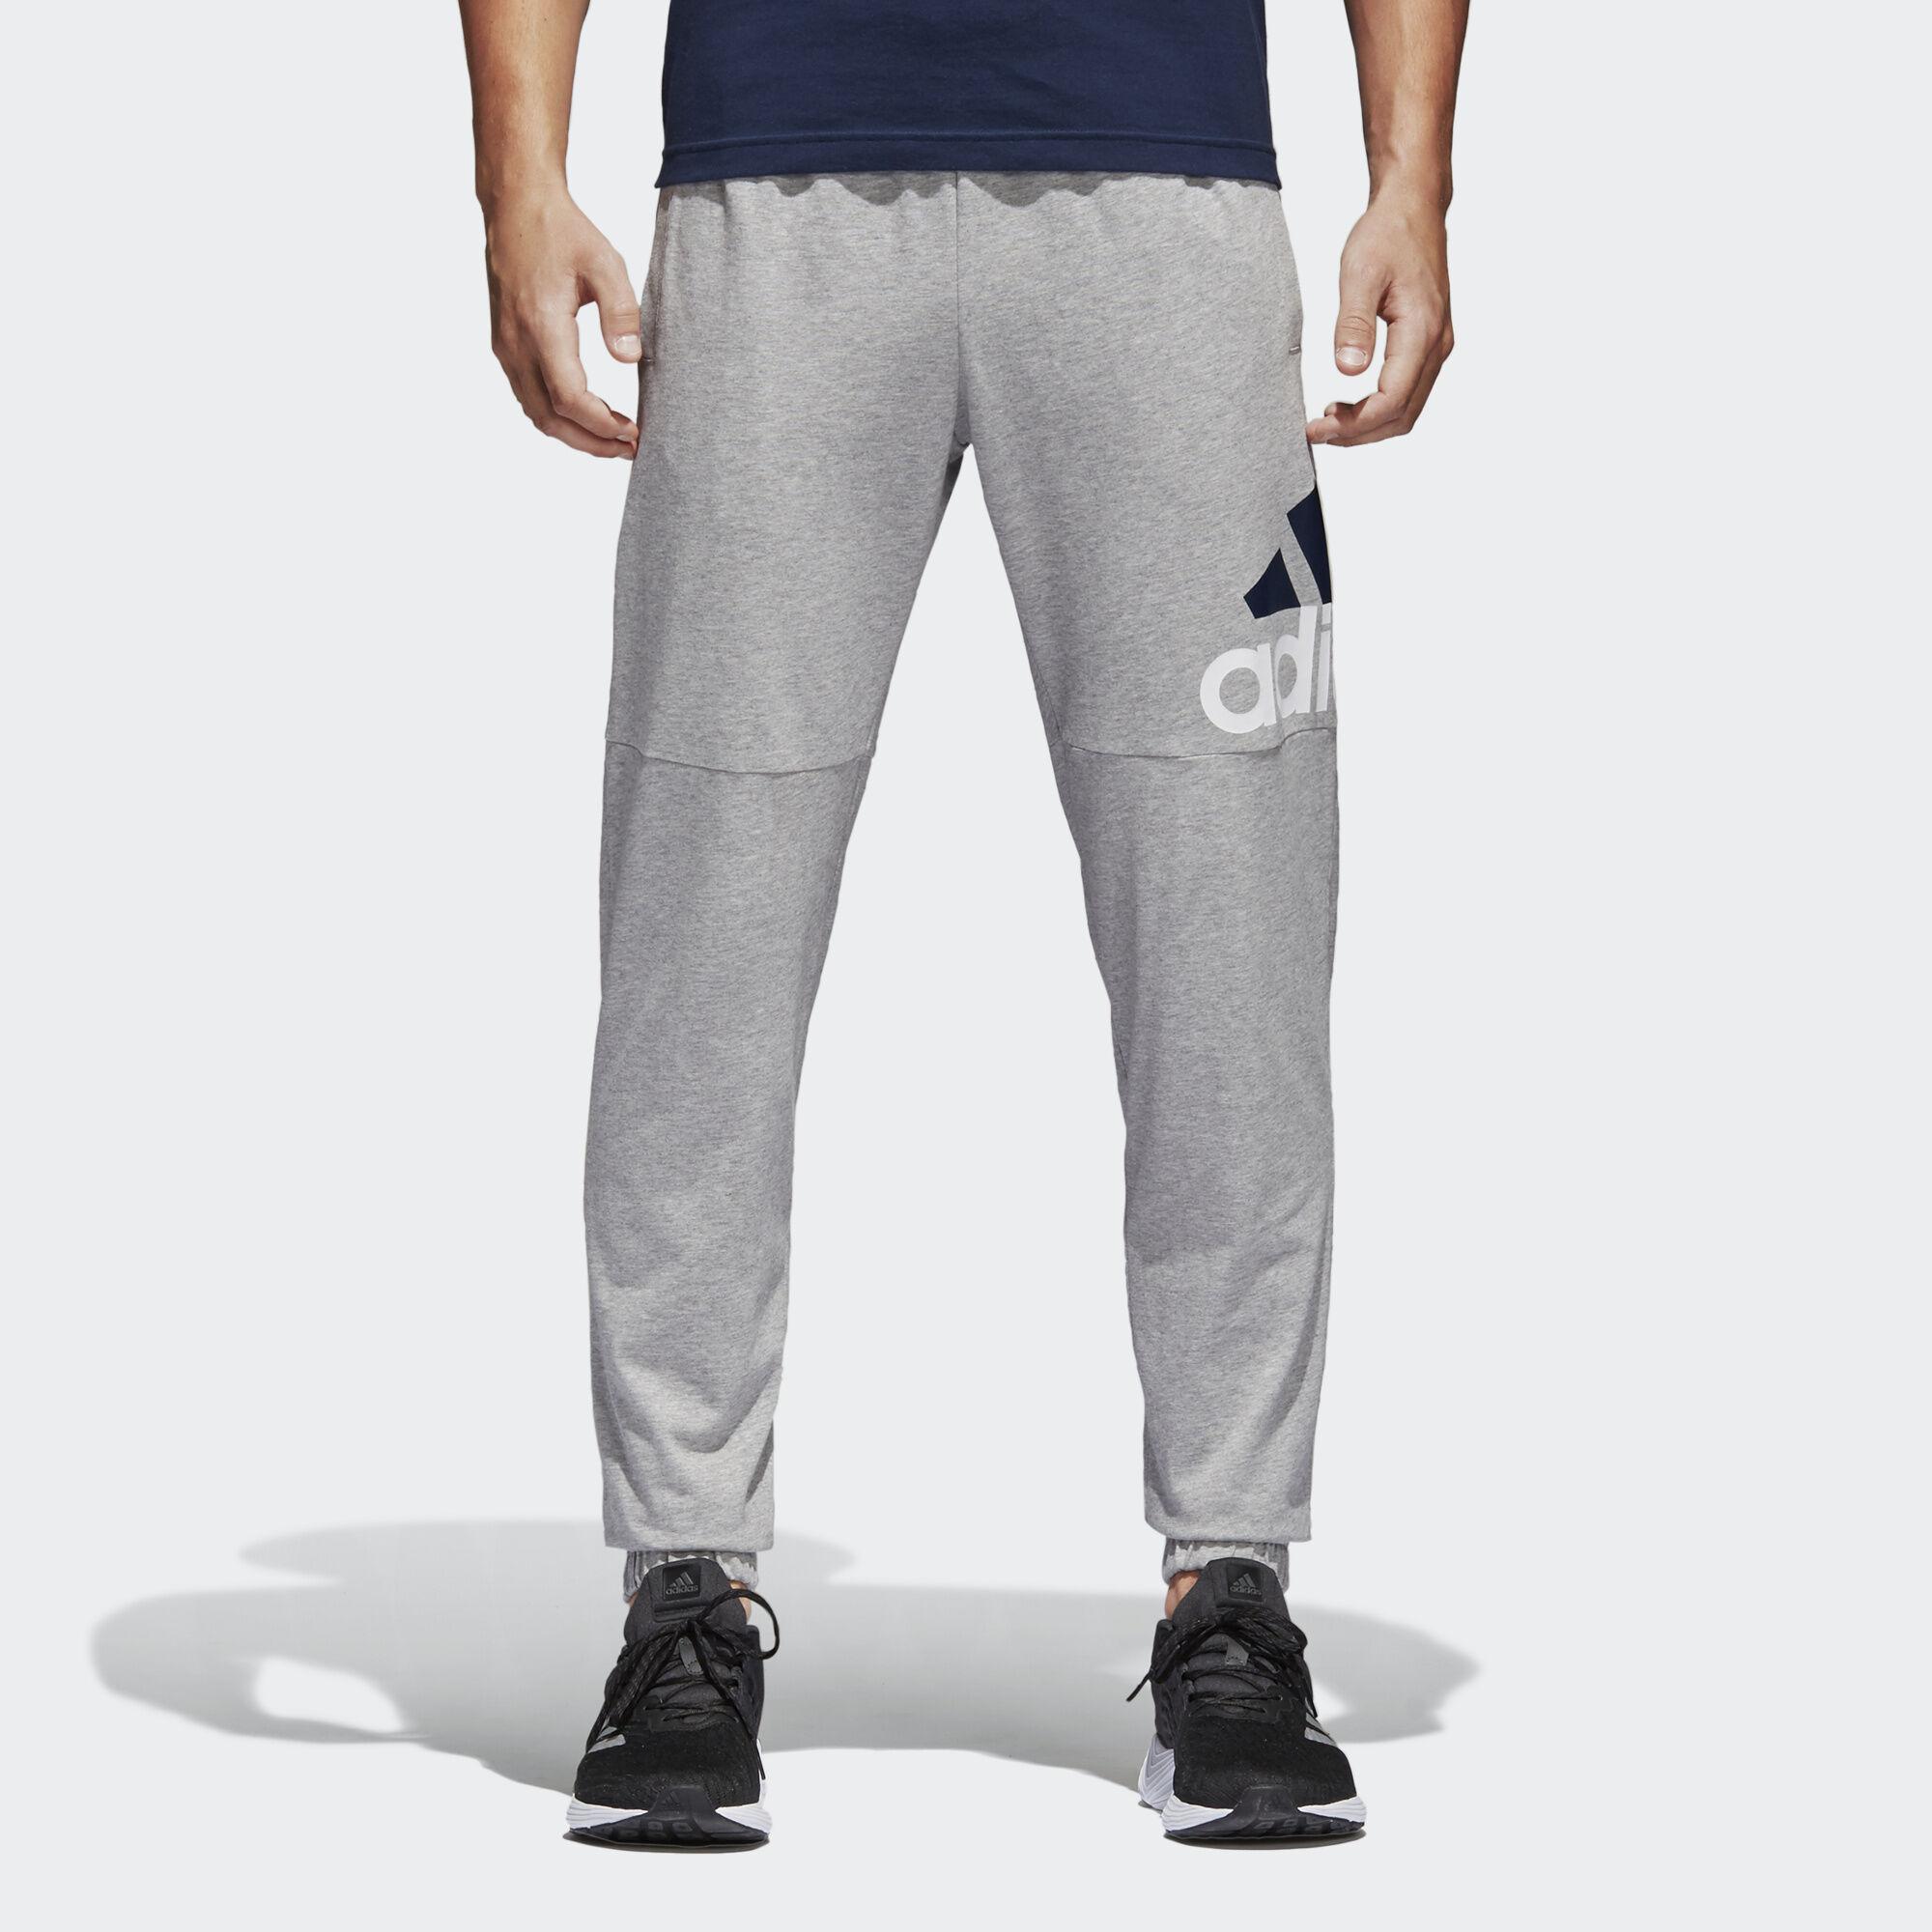 58d00af54e4c2 adidas - Essentials Performance Logo Pants Medium Grey Heather/White/Black  BK7409